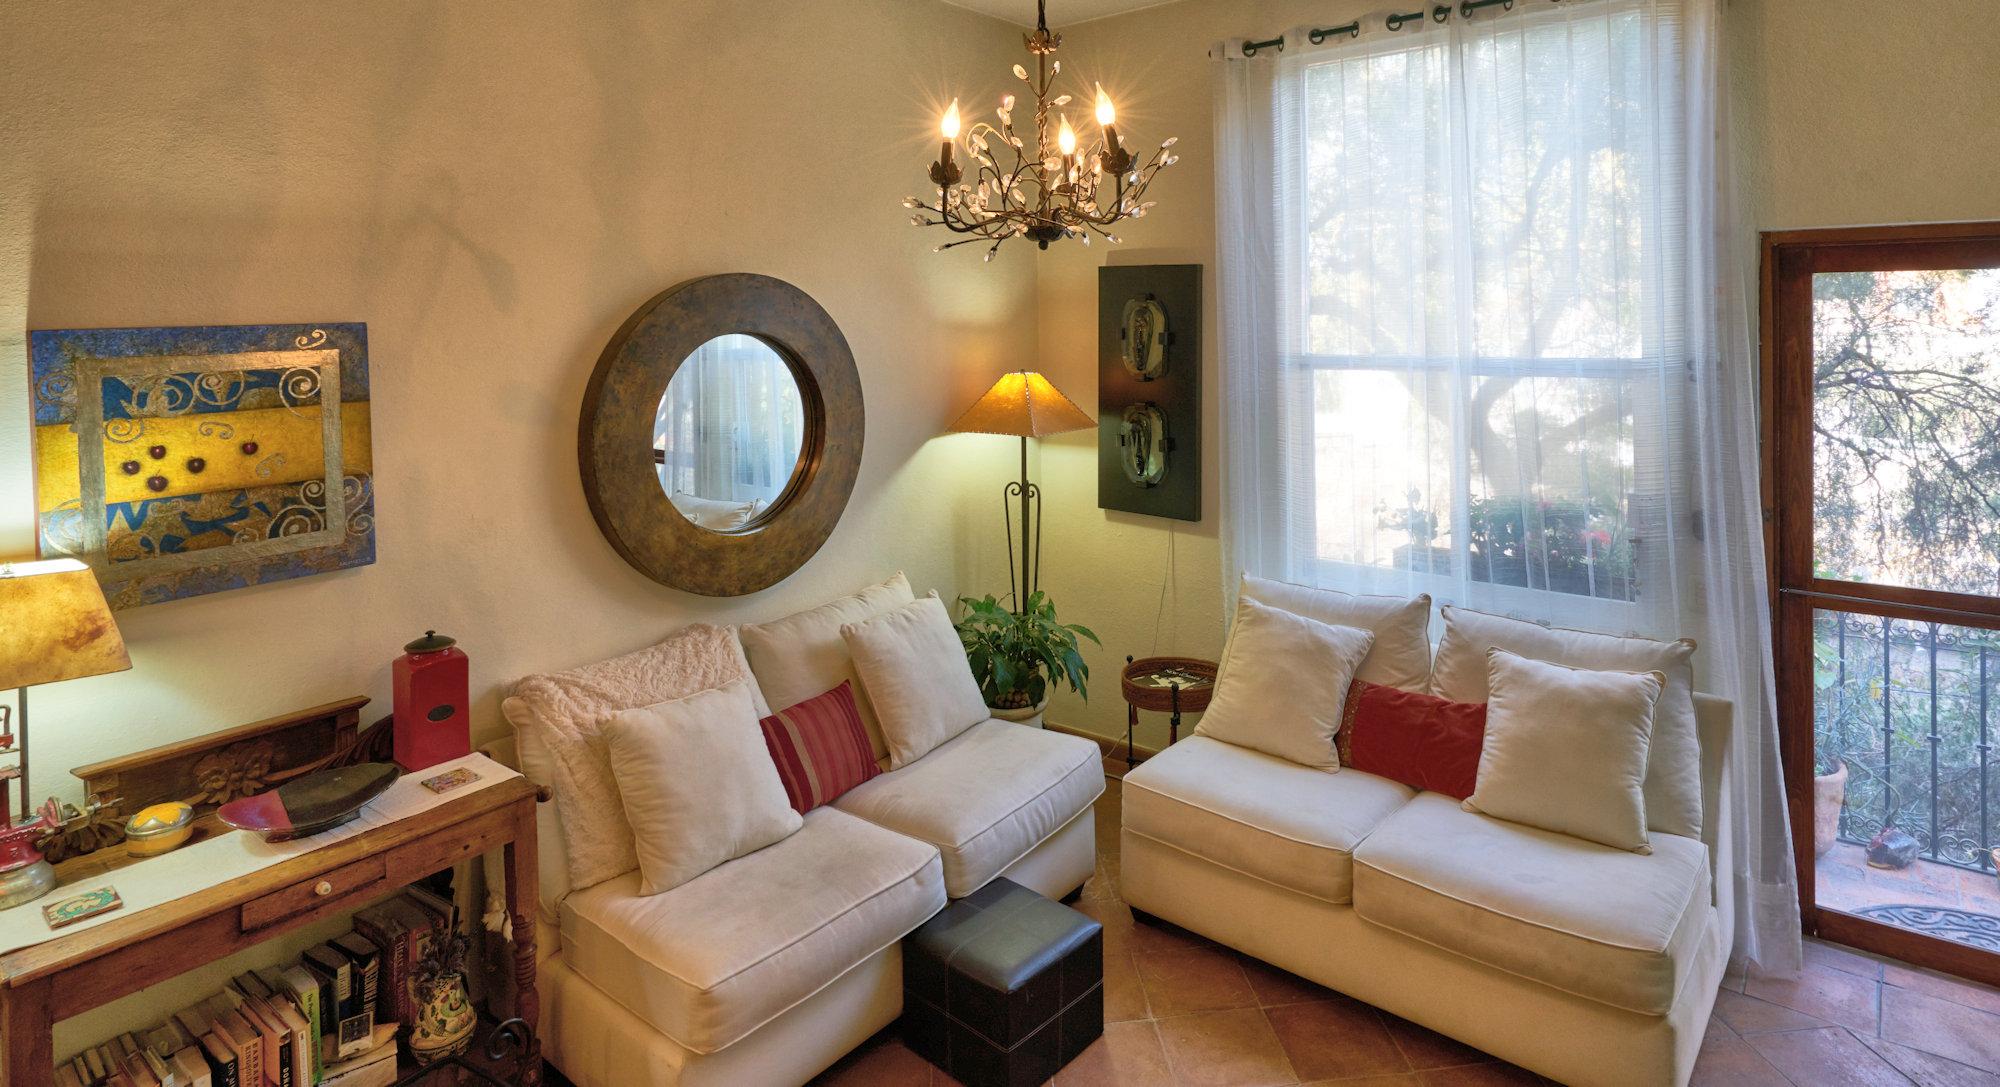 Additional photo for property listing at Santo Domingo Condo Santo Domingo 55 Suite 4D San Miguel De Allende, Guanajuato 37700 México